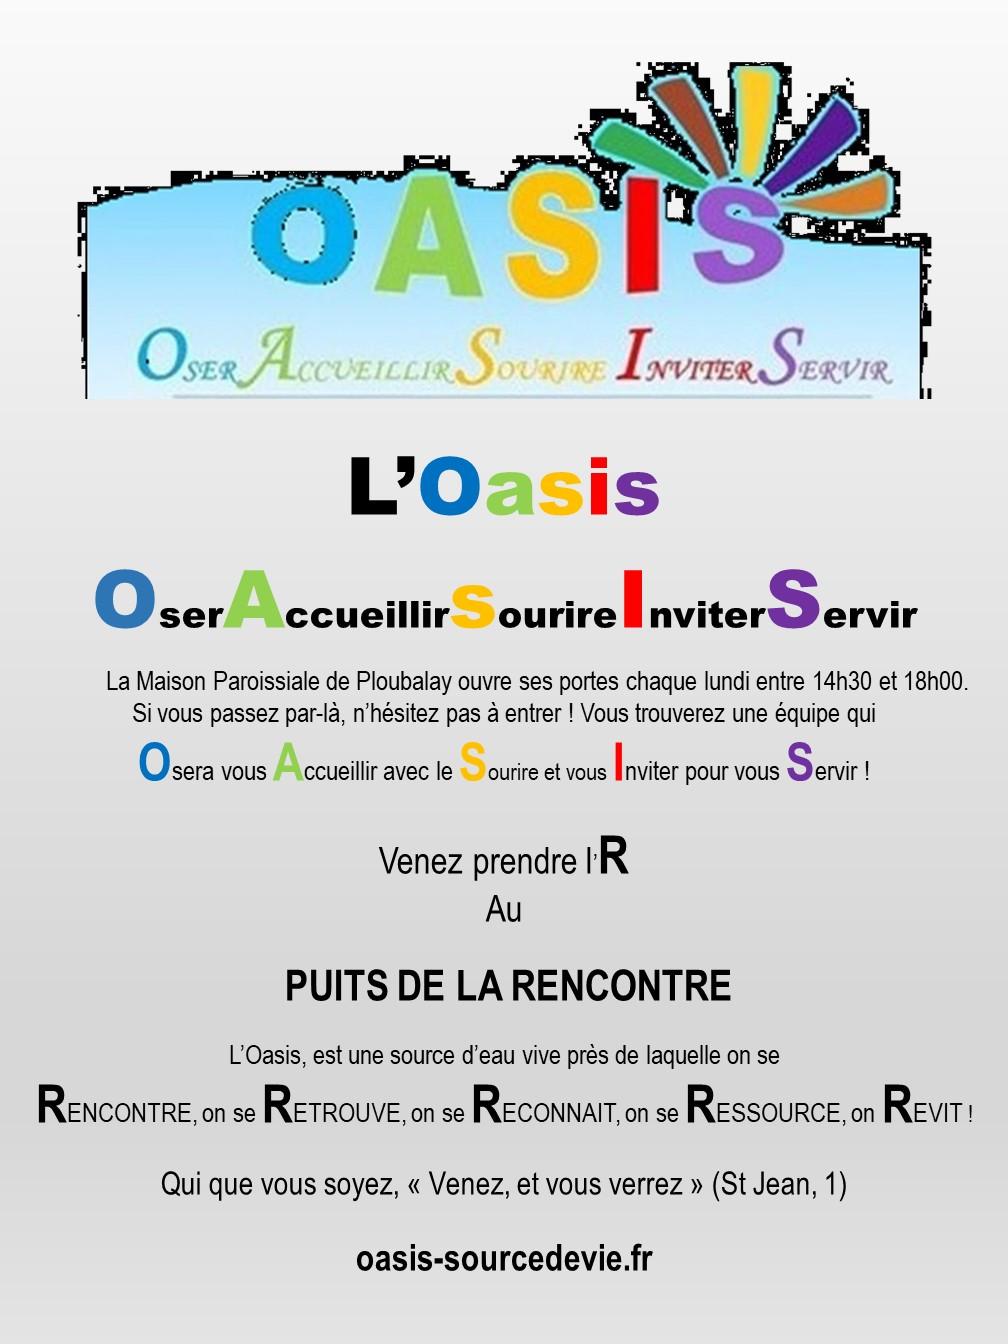 L'OASIS Oser Accueillir Sourire Inviter Servir